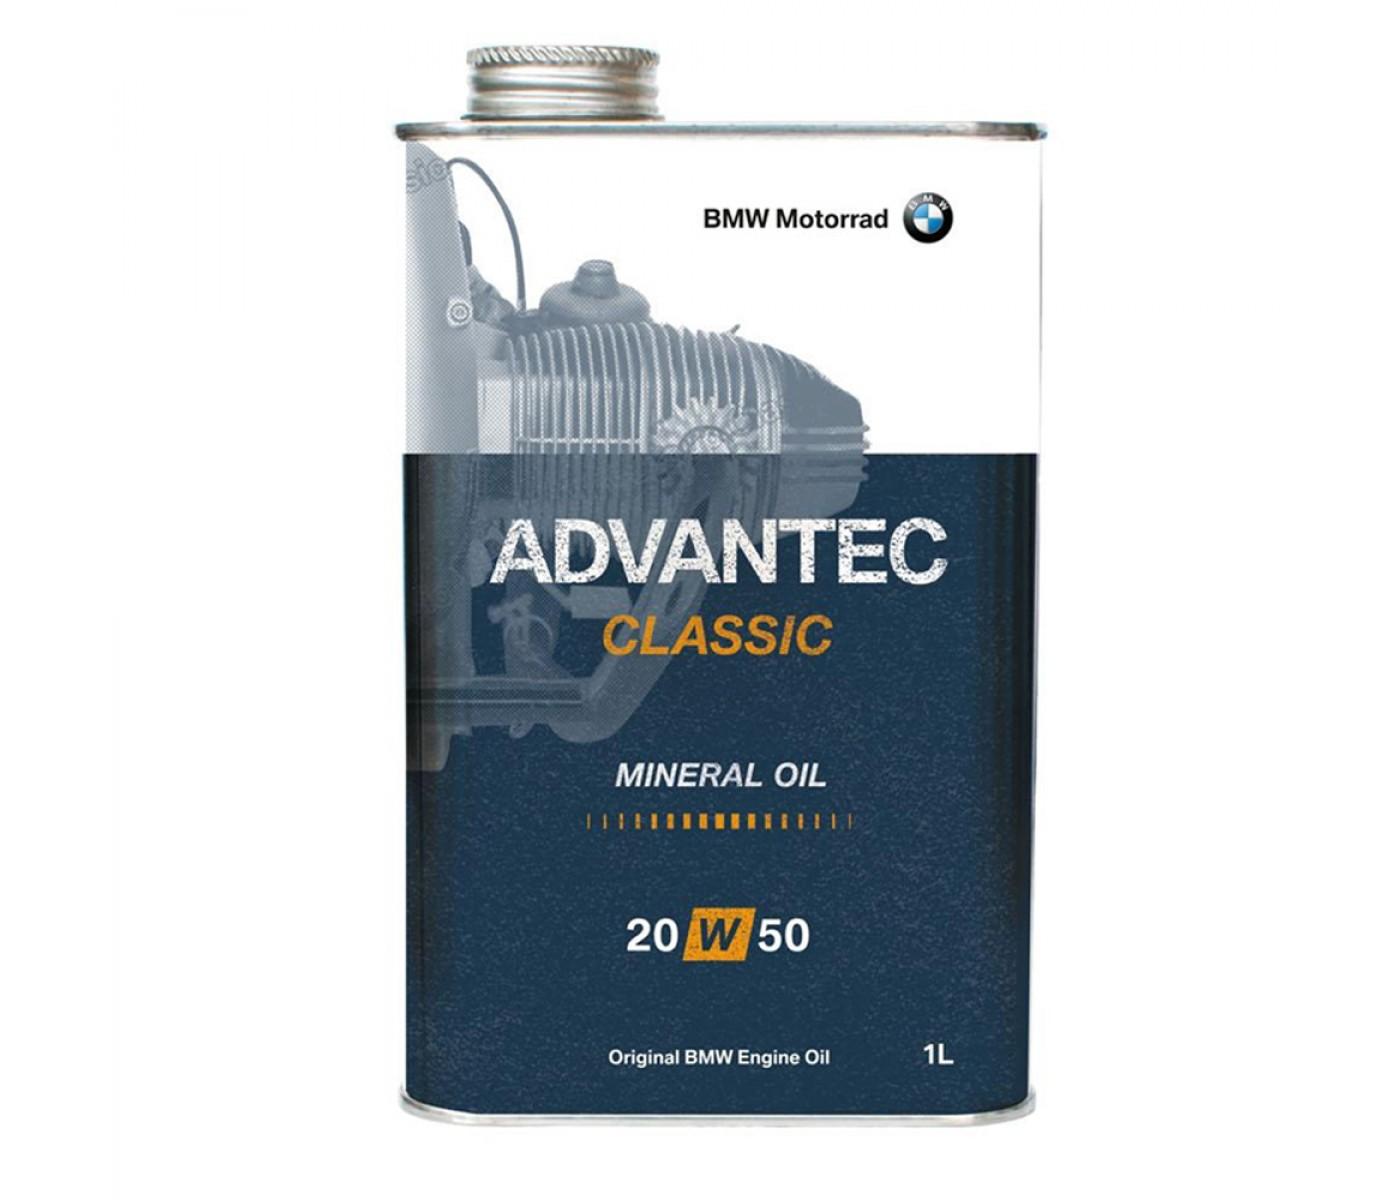 ad71849cab BMW Motorrad Λάδι κινητήρα ADVANTEC Classic ΛΙΠΑΝΤΙΚΑ   ΚΑΘΑΡΙΣΤΙΚΑ